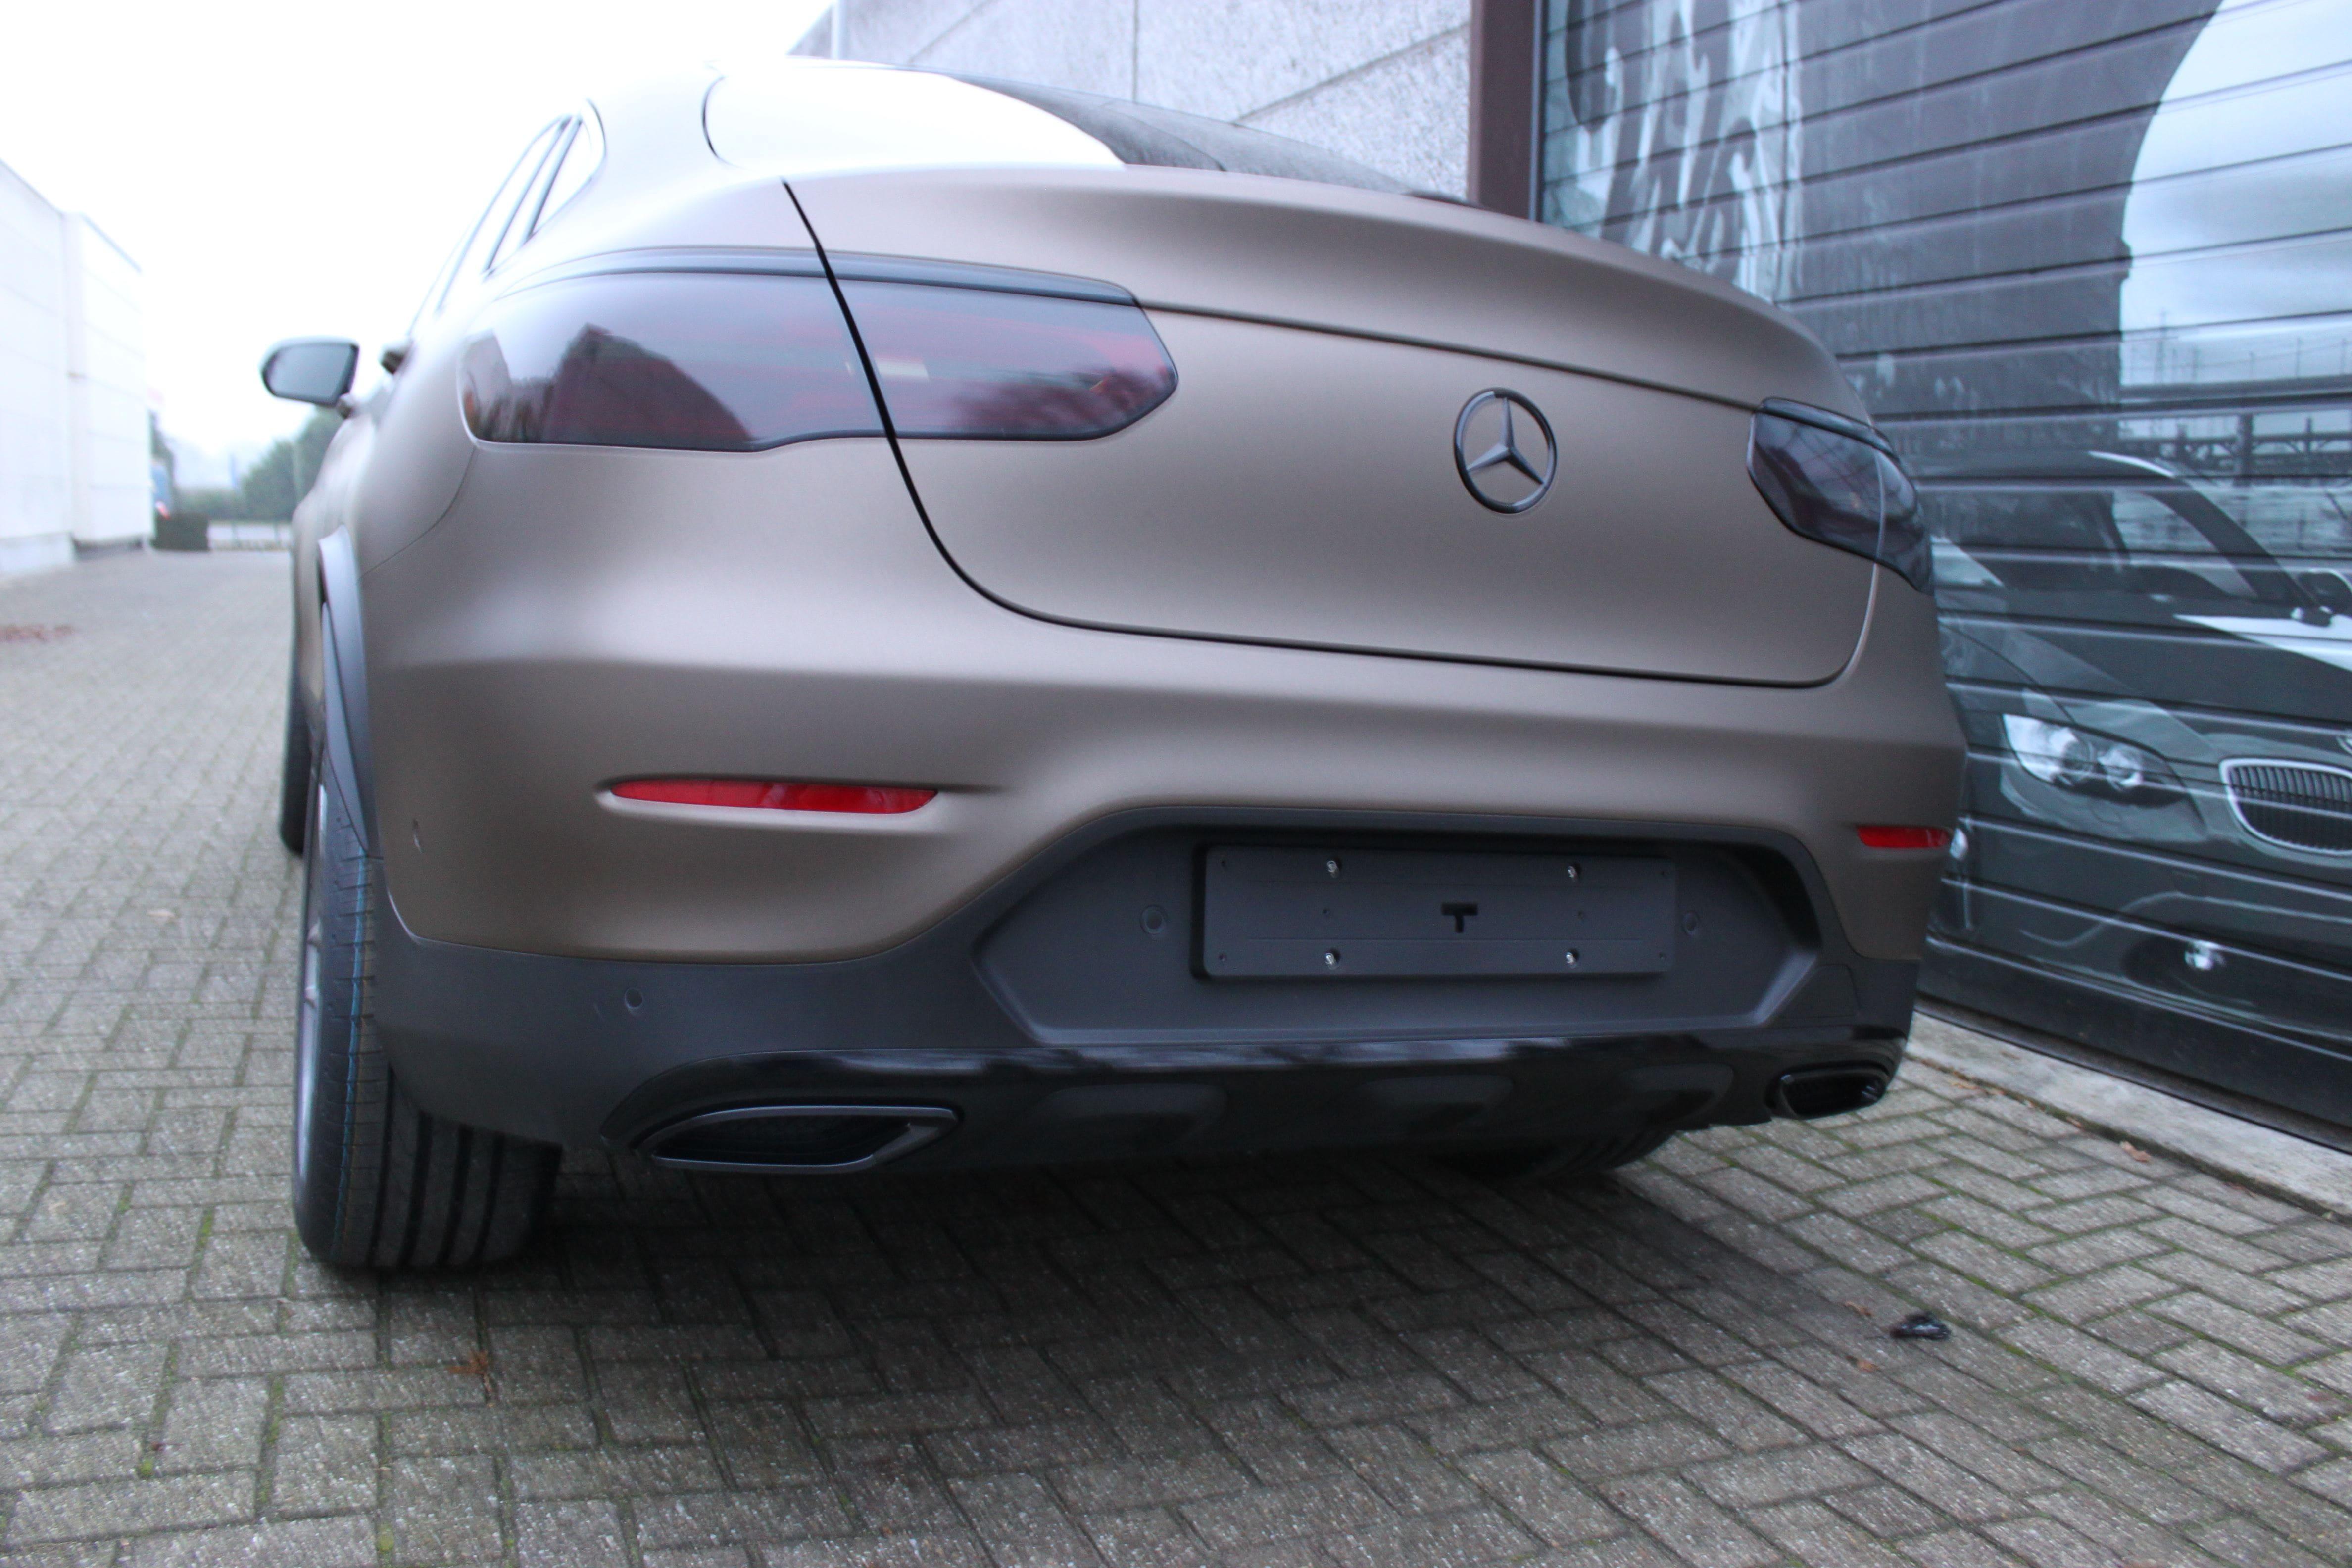 Mercedes GLC Coupe Matte metallic brown, Carwrapping door Wrapmyride.nu Foto-nr:9352, ©2021